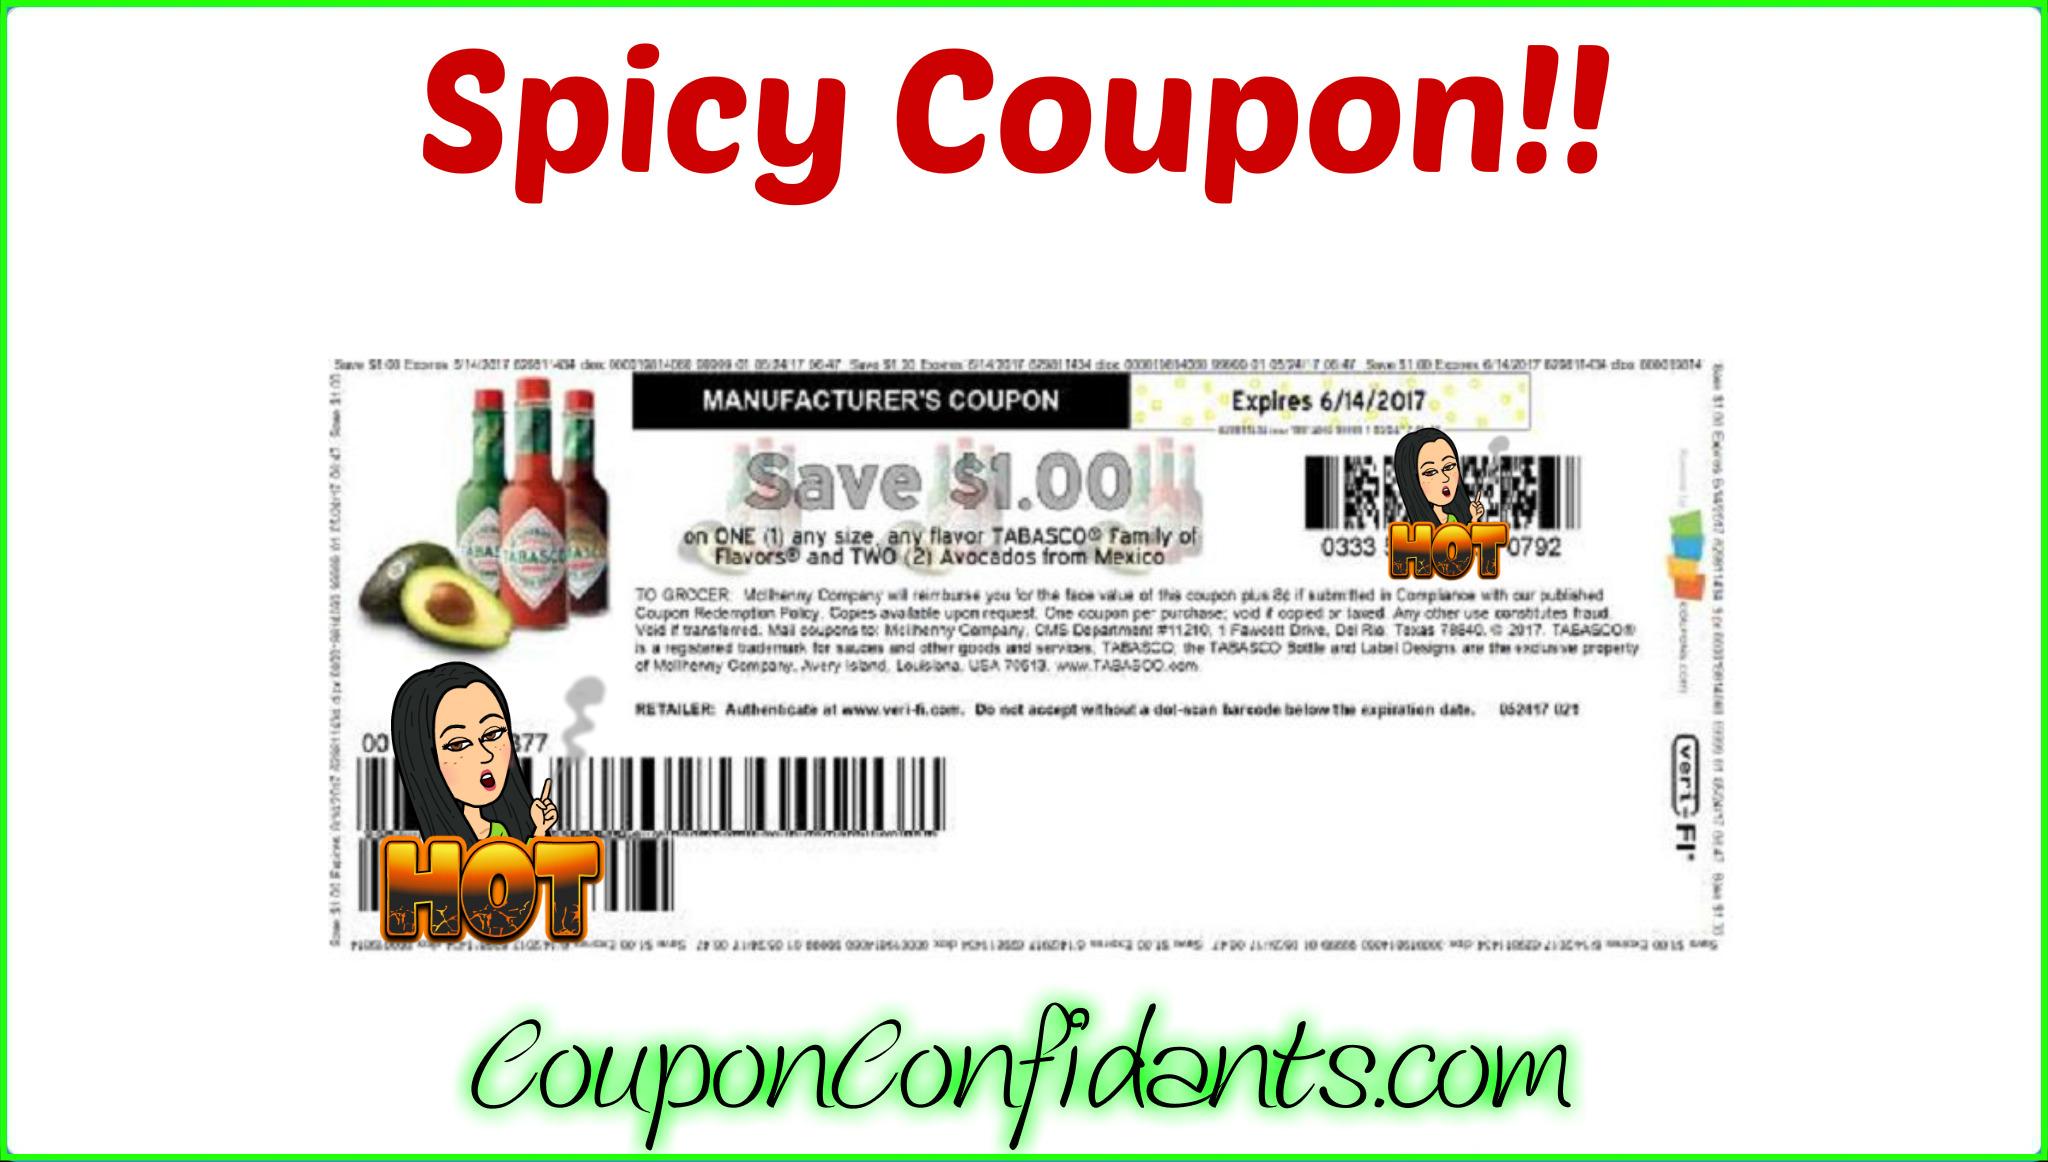 HOT Tabasco & Avocado Coupon!! Print NOW!